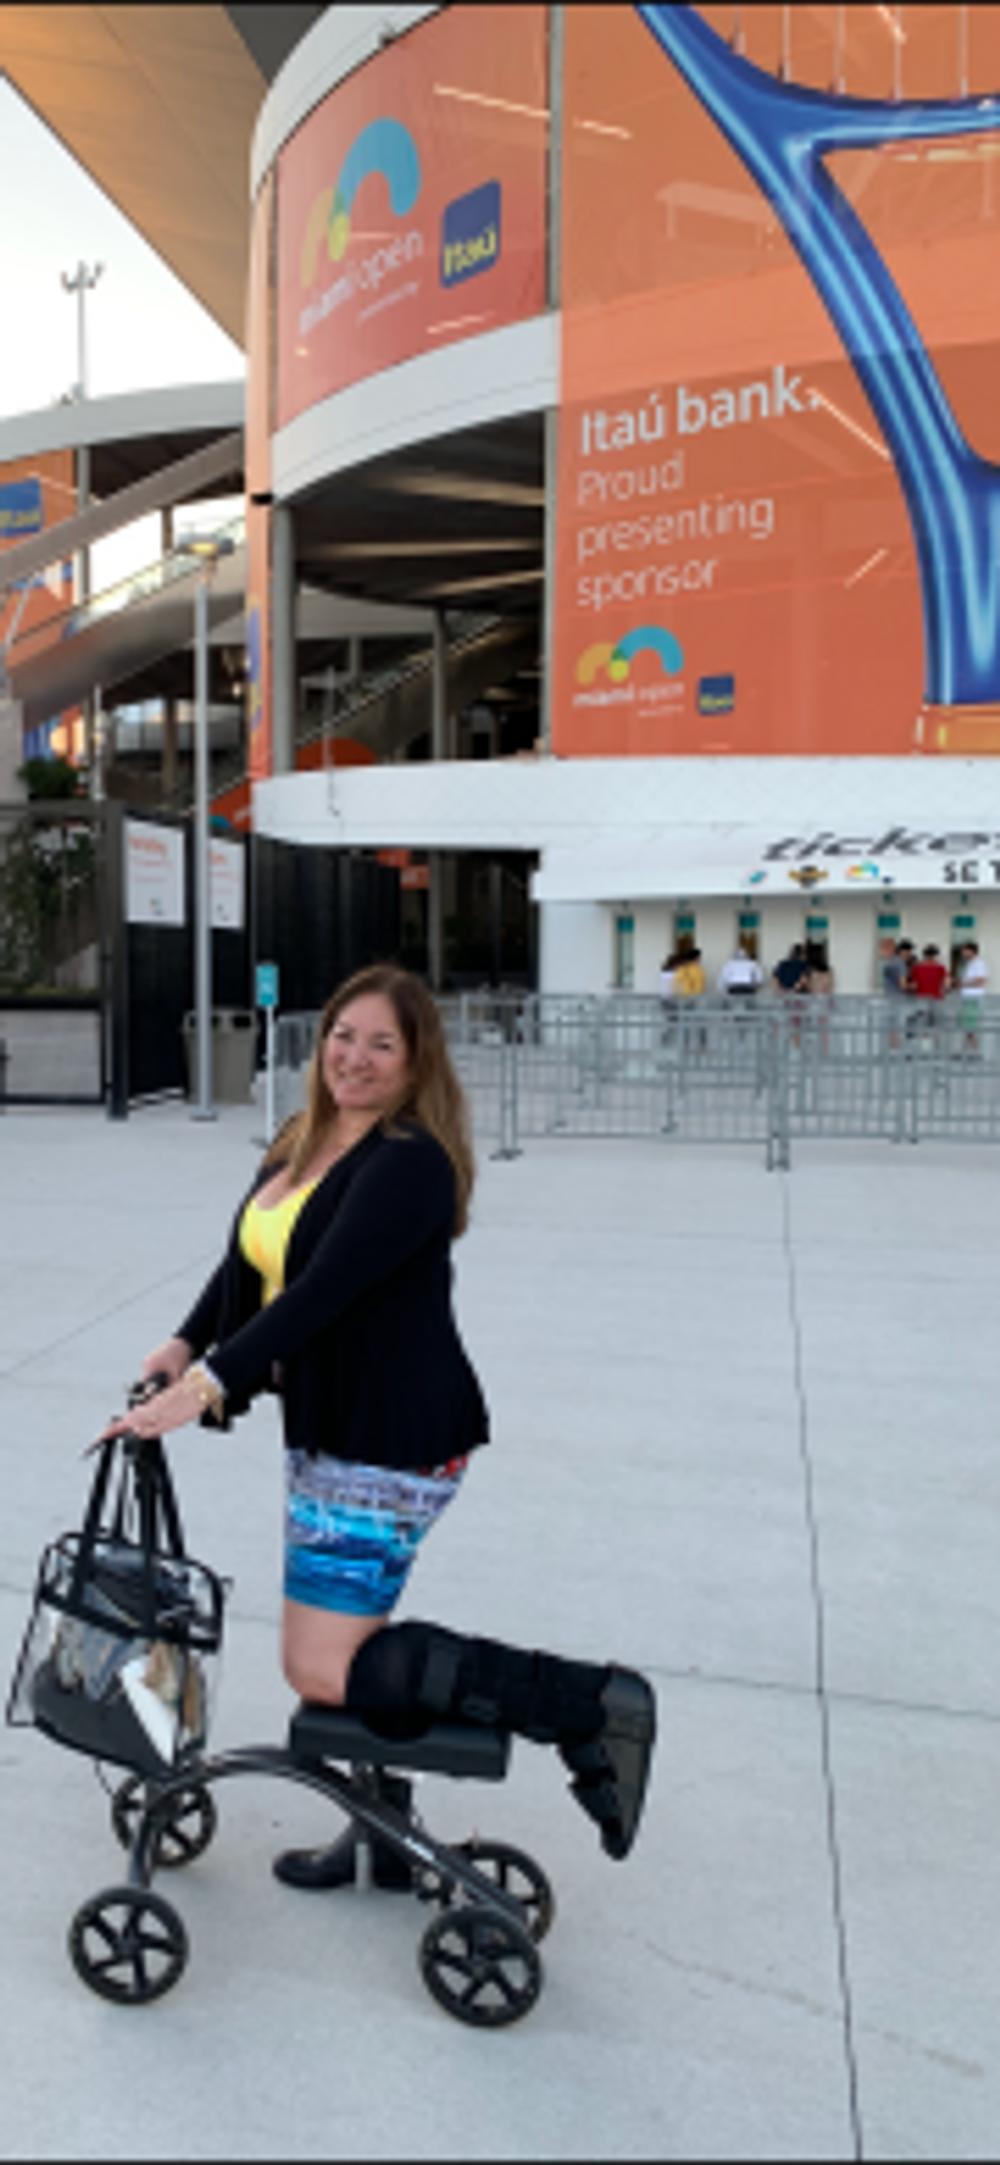 Hard Rock Stadium, Miami Open, Miami, Florida - tennistravelsite.com